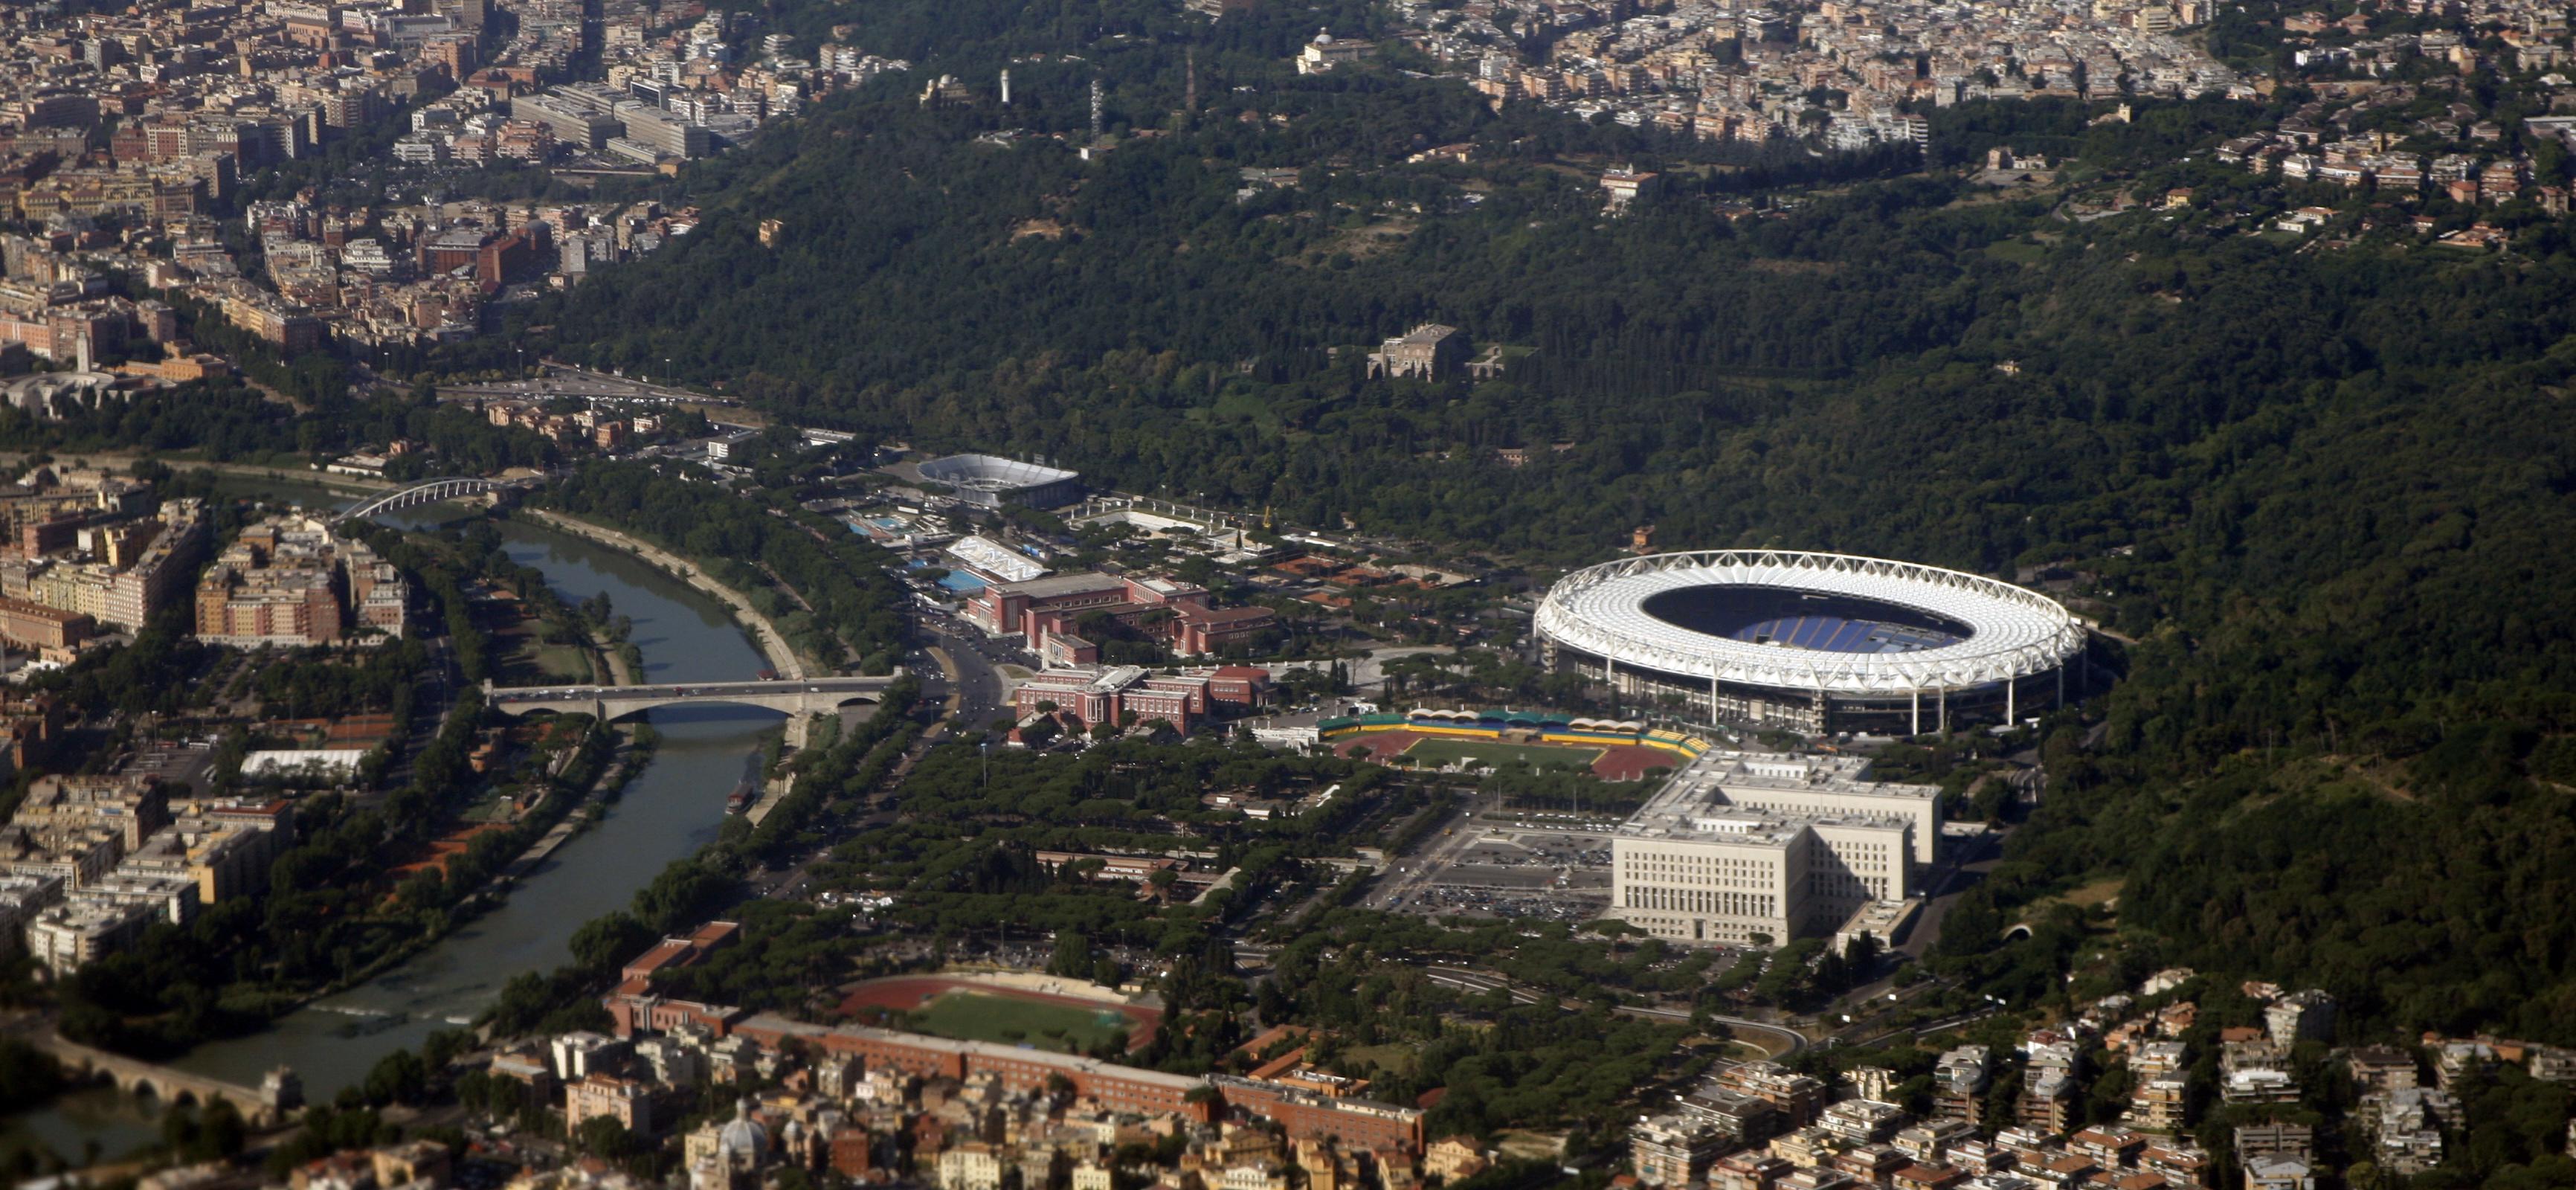 http://www.carrazza.it/wp-content/uploads/2016/12/19-Veduta-oggi-Stadio-Olimpico-1.jpg